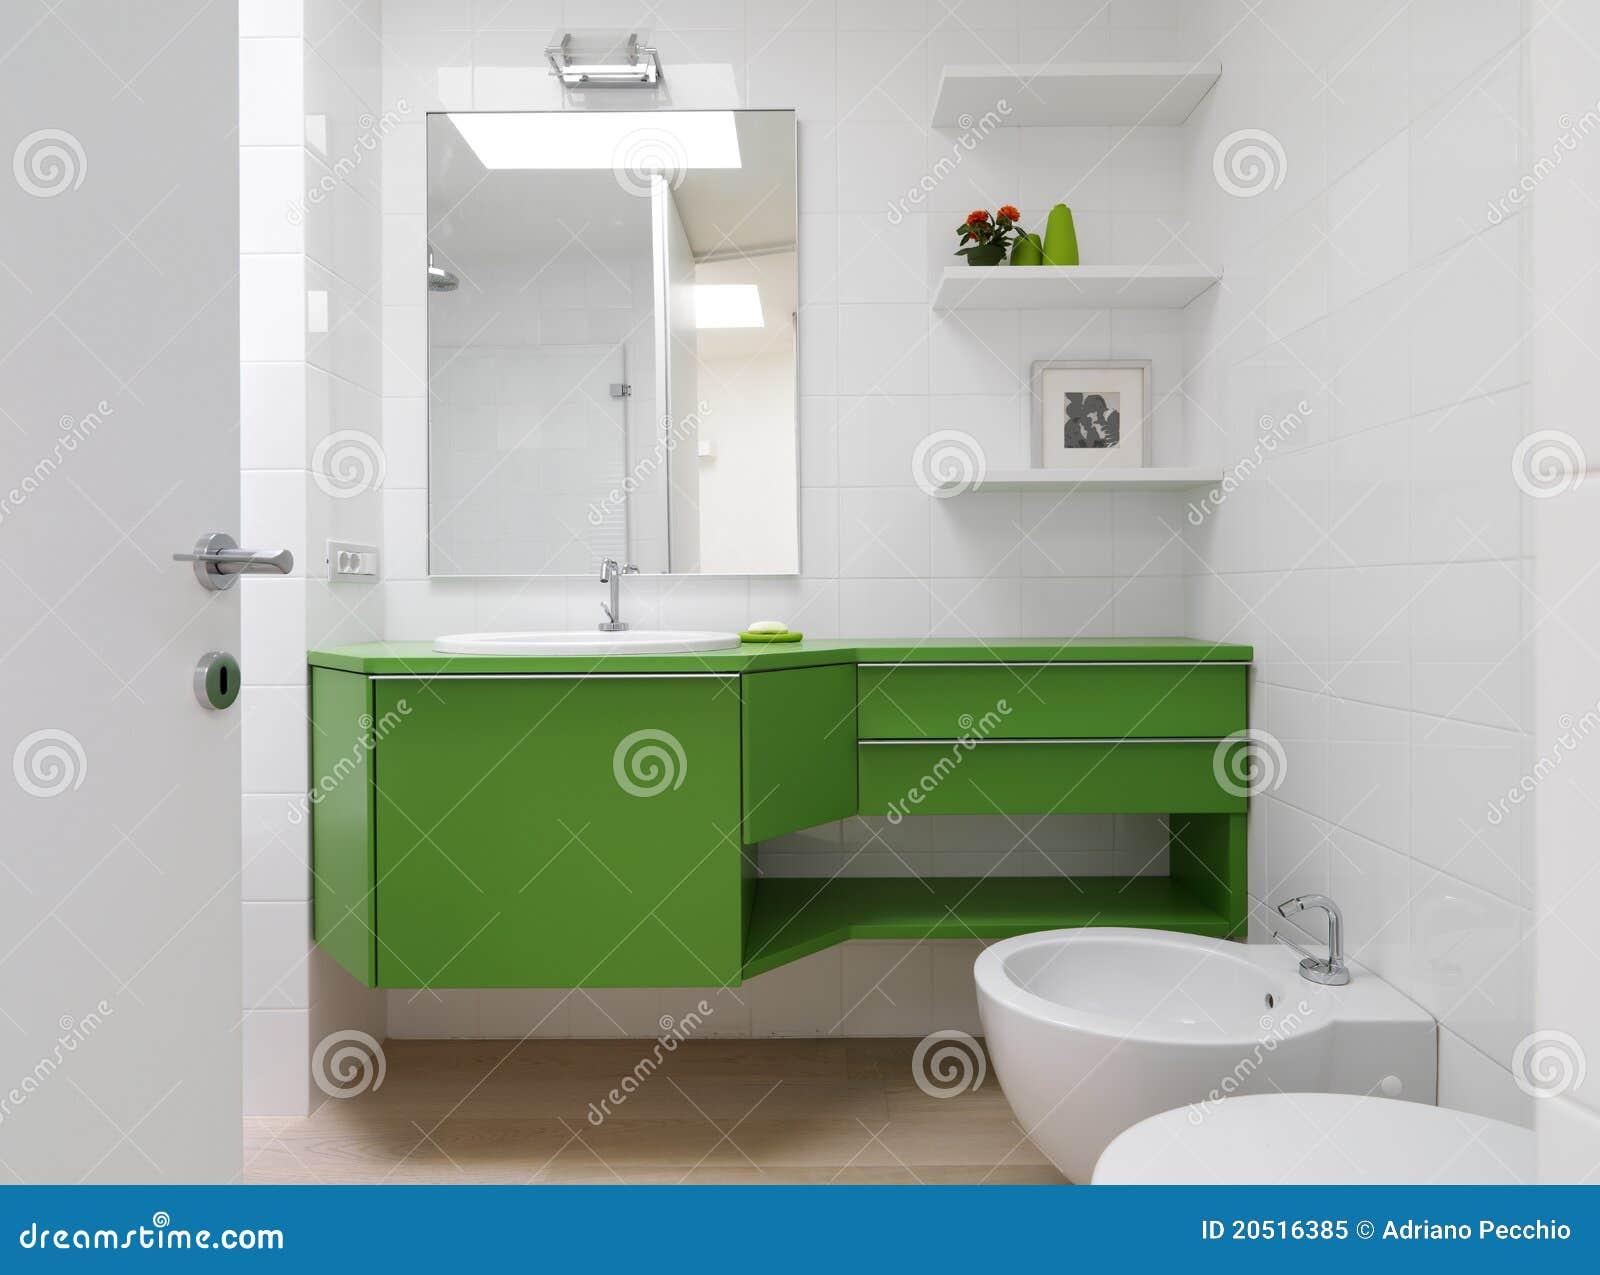 Cuarto De Ba O Moderno Con Muebles Coloridos Imagen De Archivo